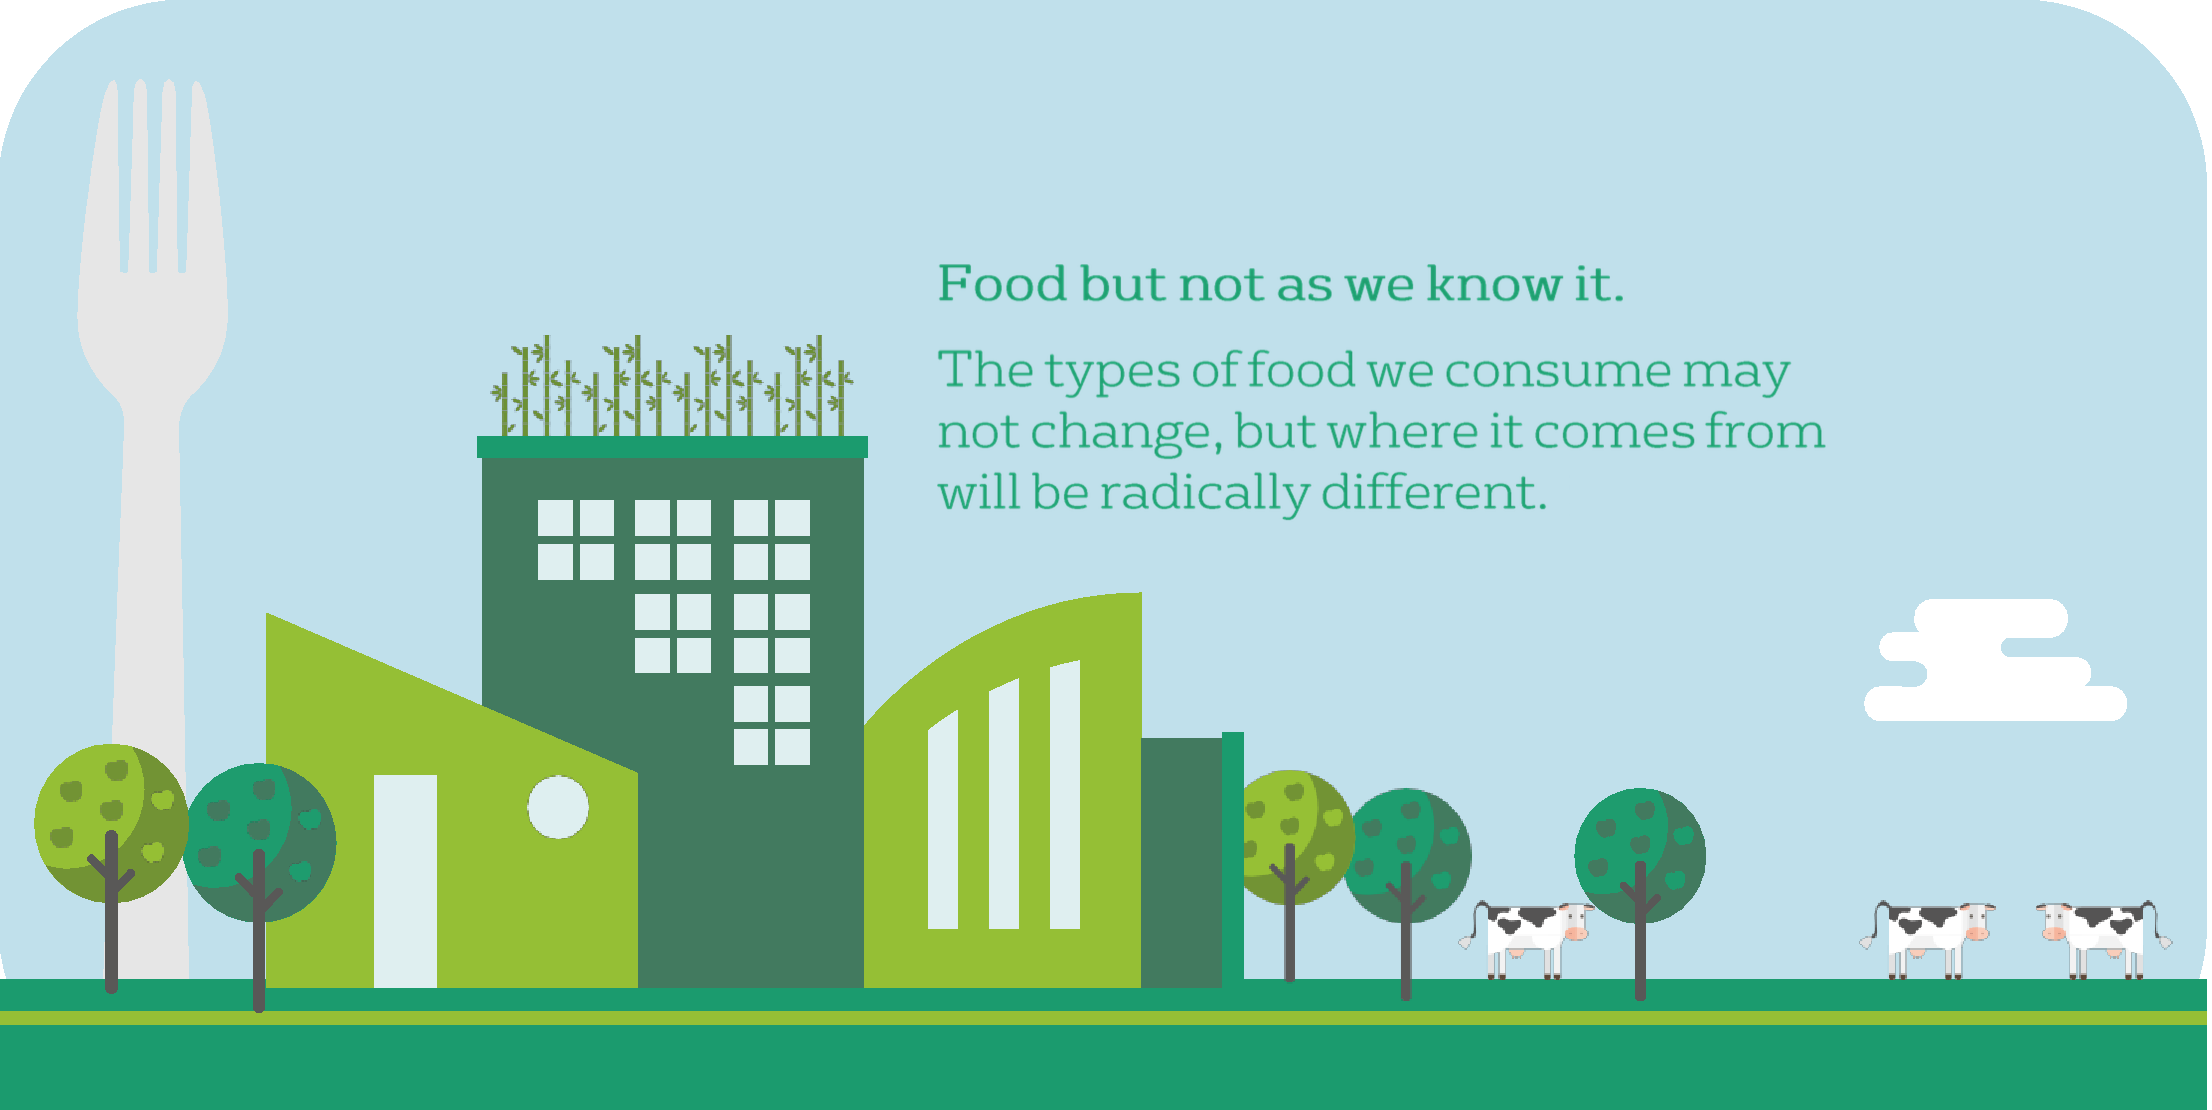 Image and statement on food waste - Veolia